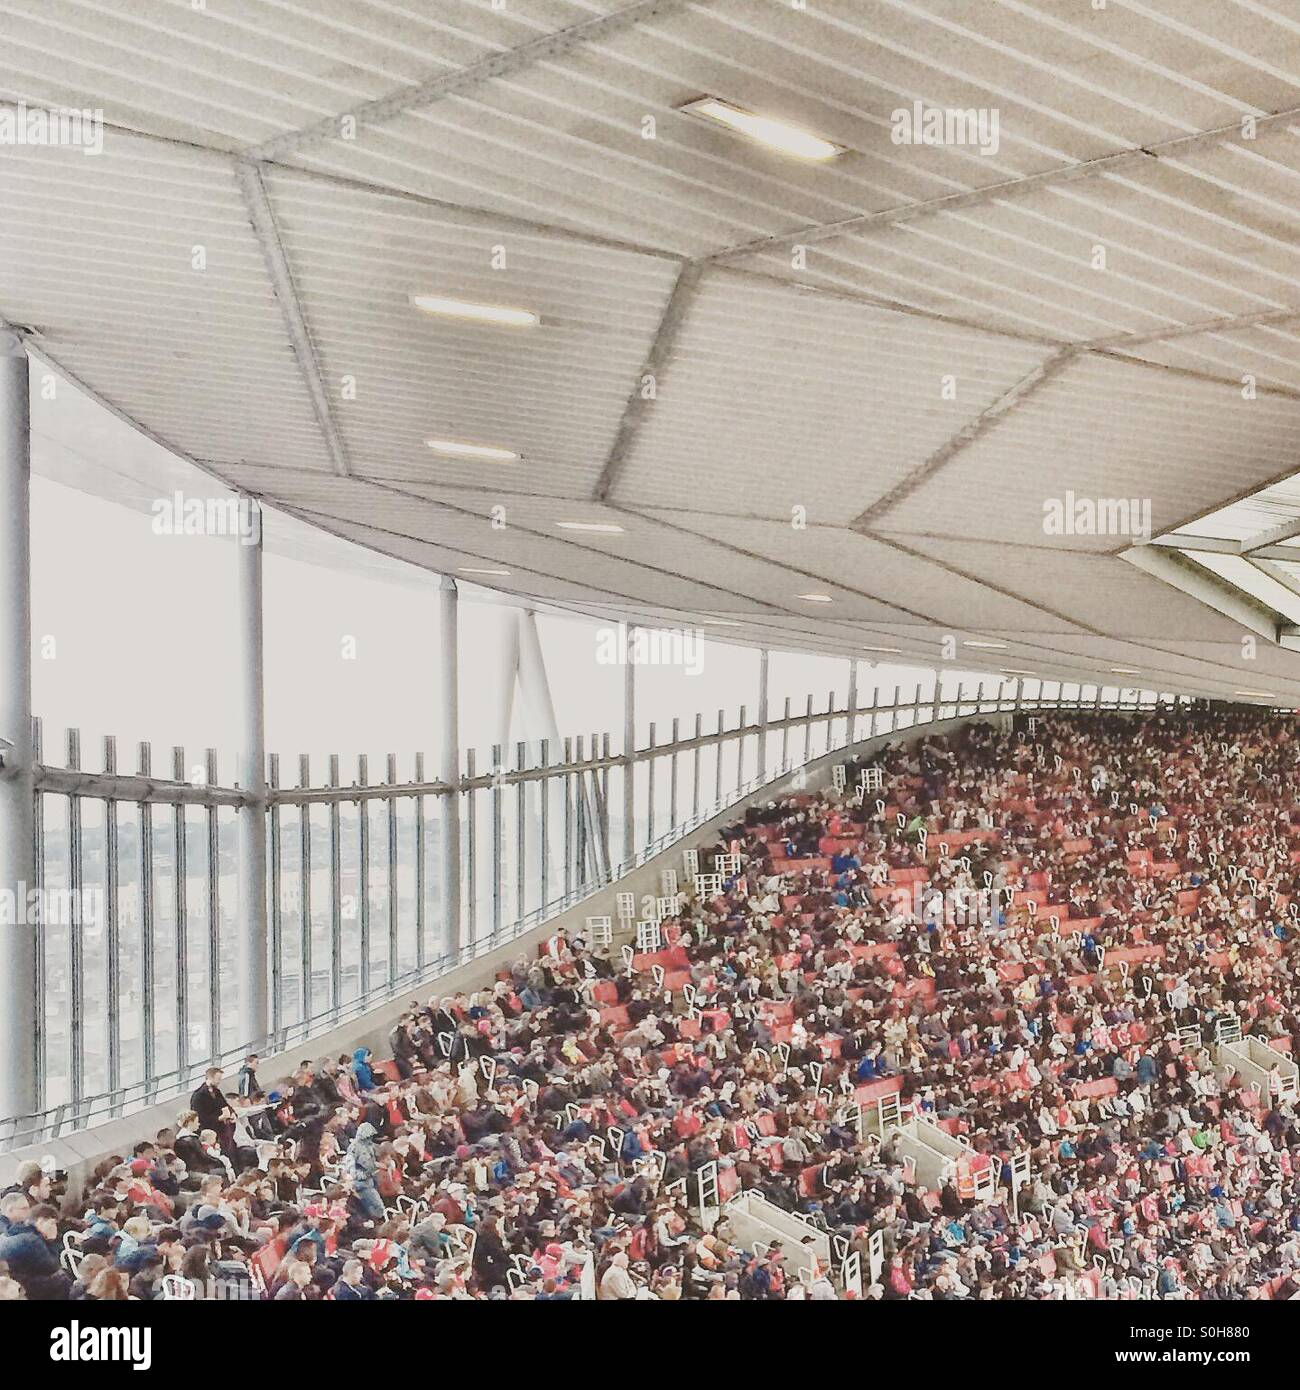 The Emirates Stadium, home of Arsenal Football Club - Stock Image